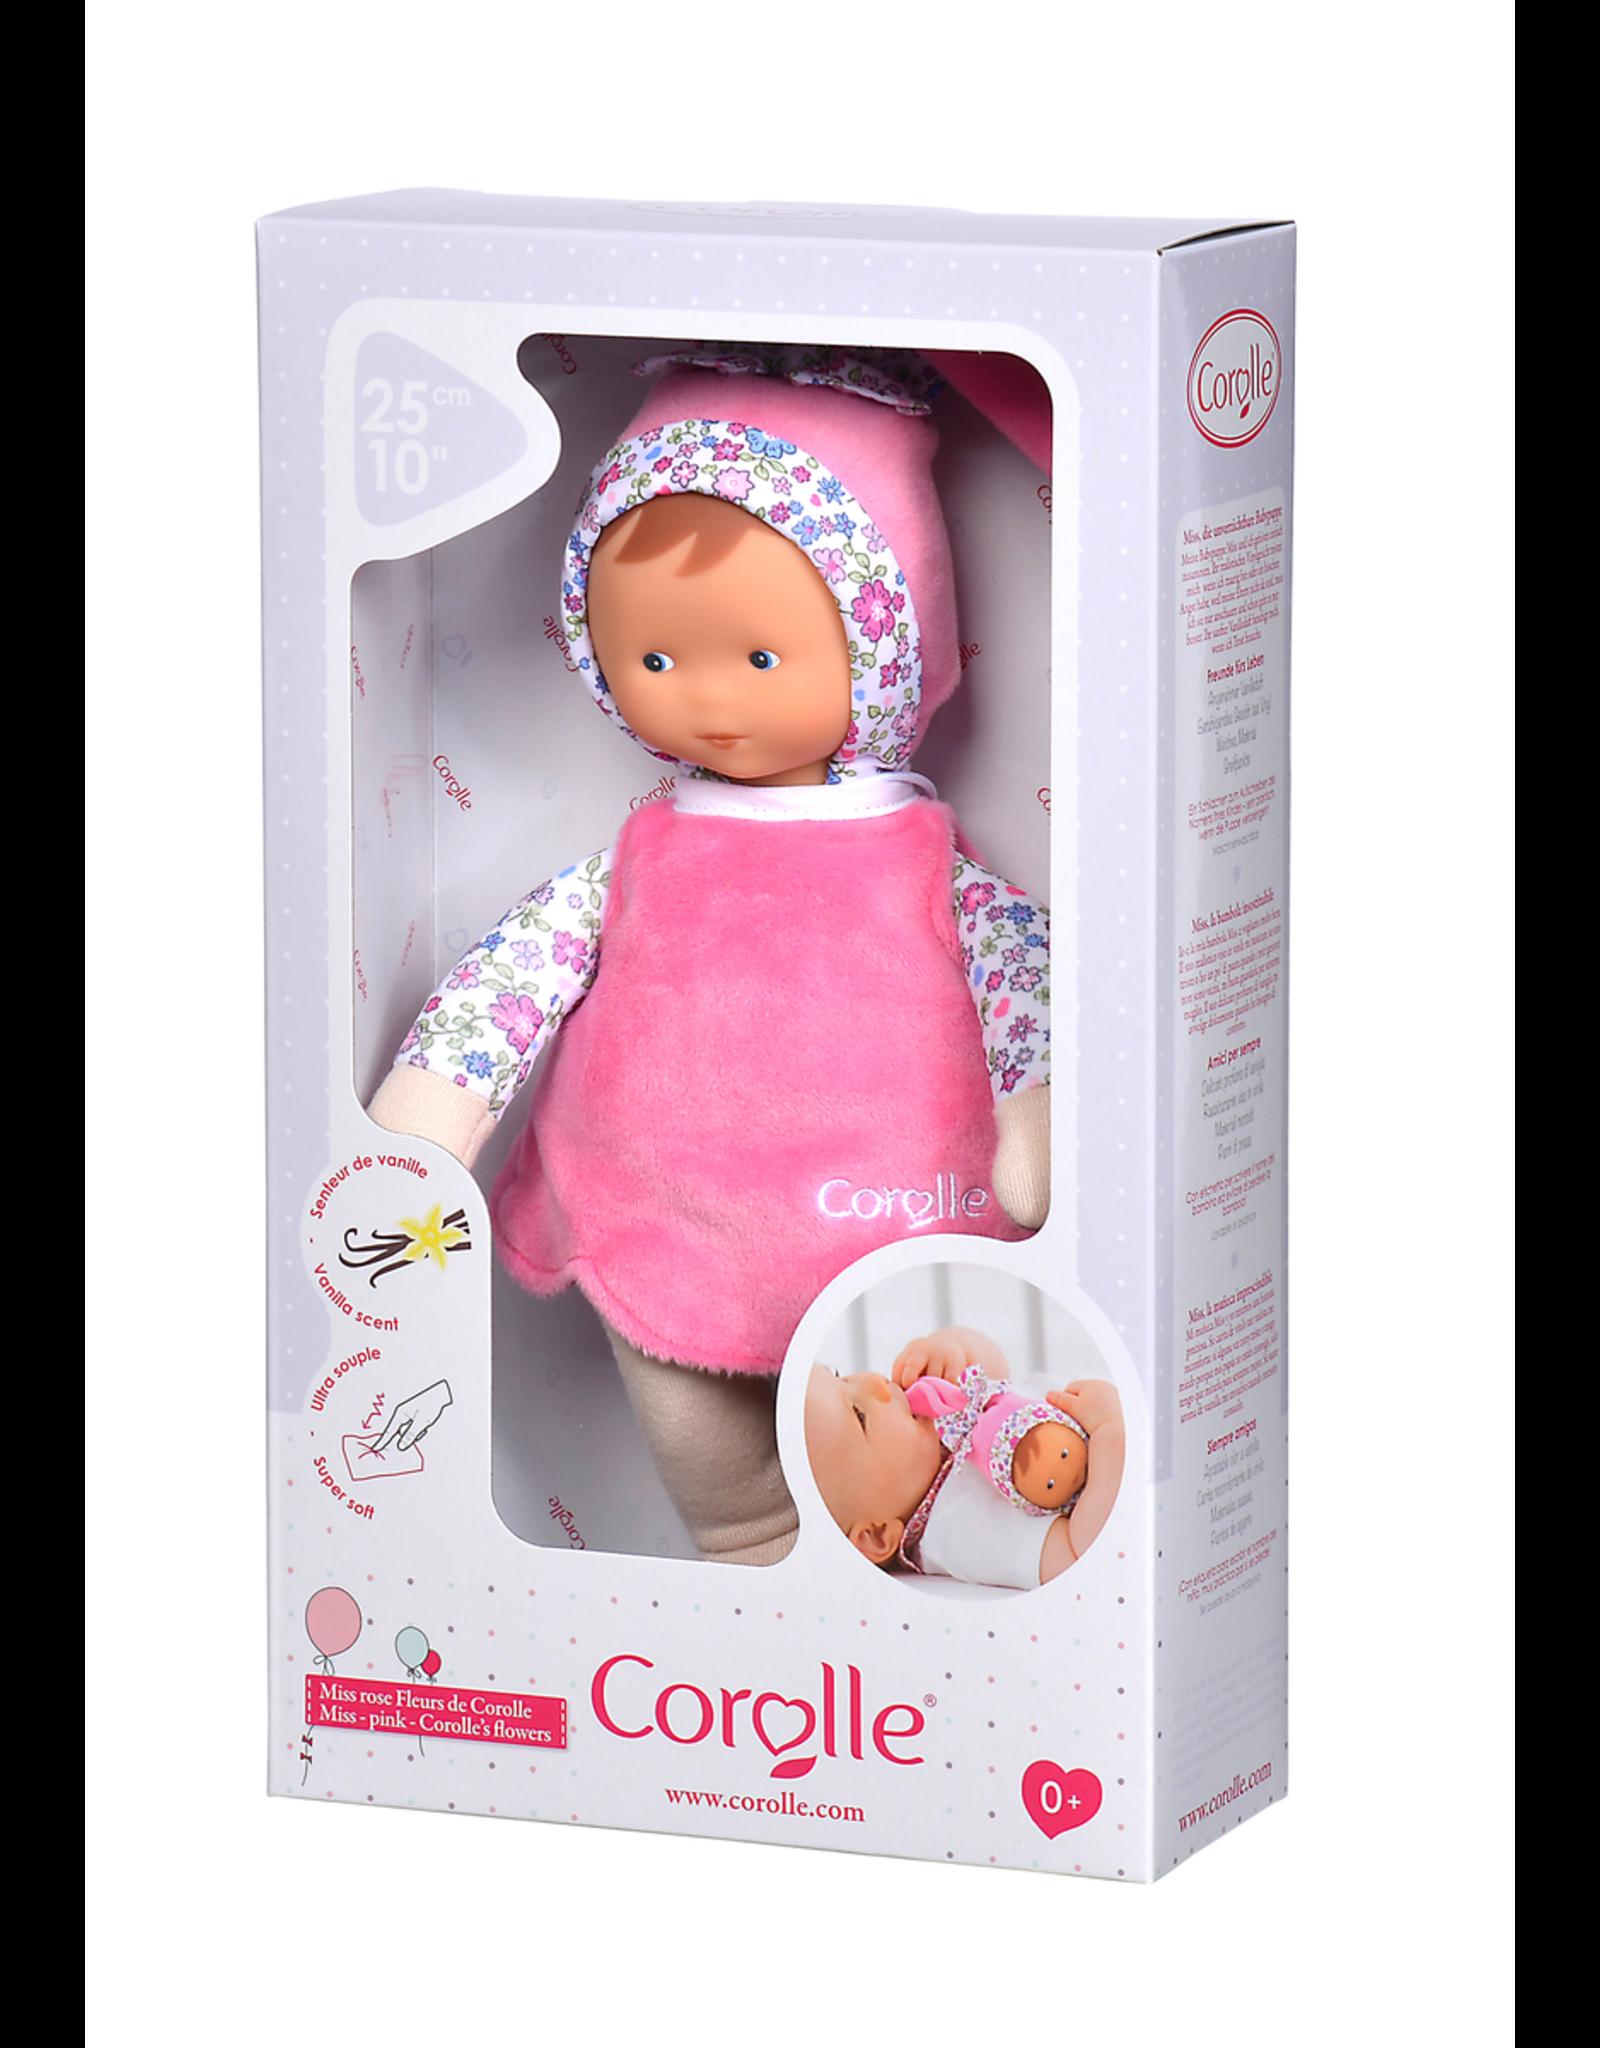 Corolle Corolle - Miss Pink - Corolle's Flowers  - veilige baby pop